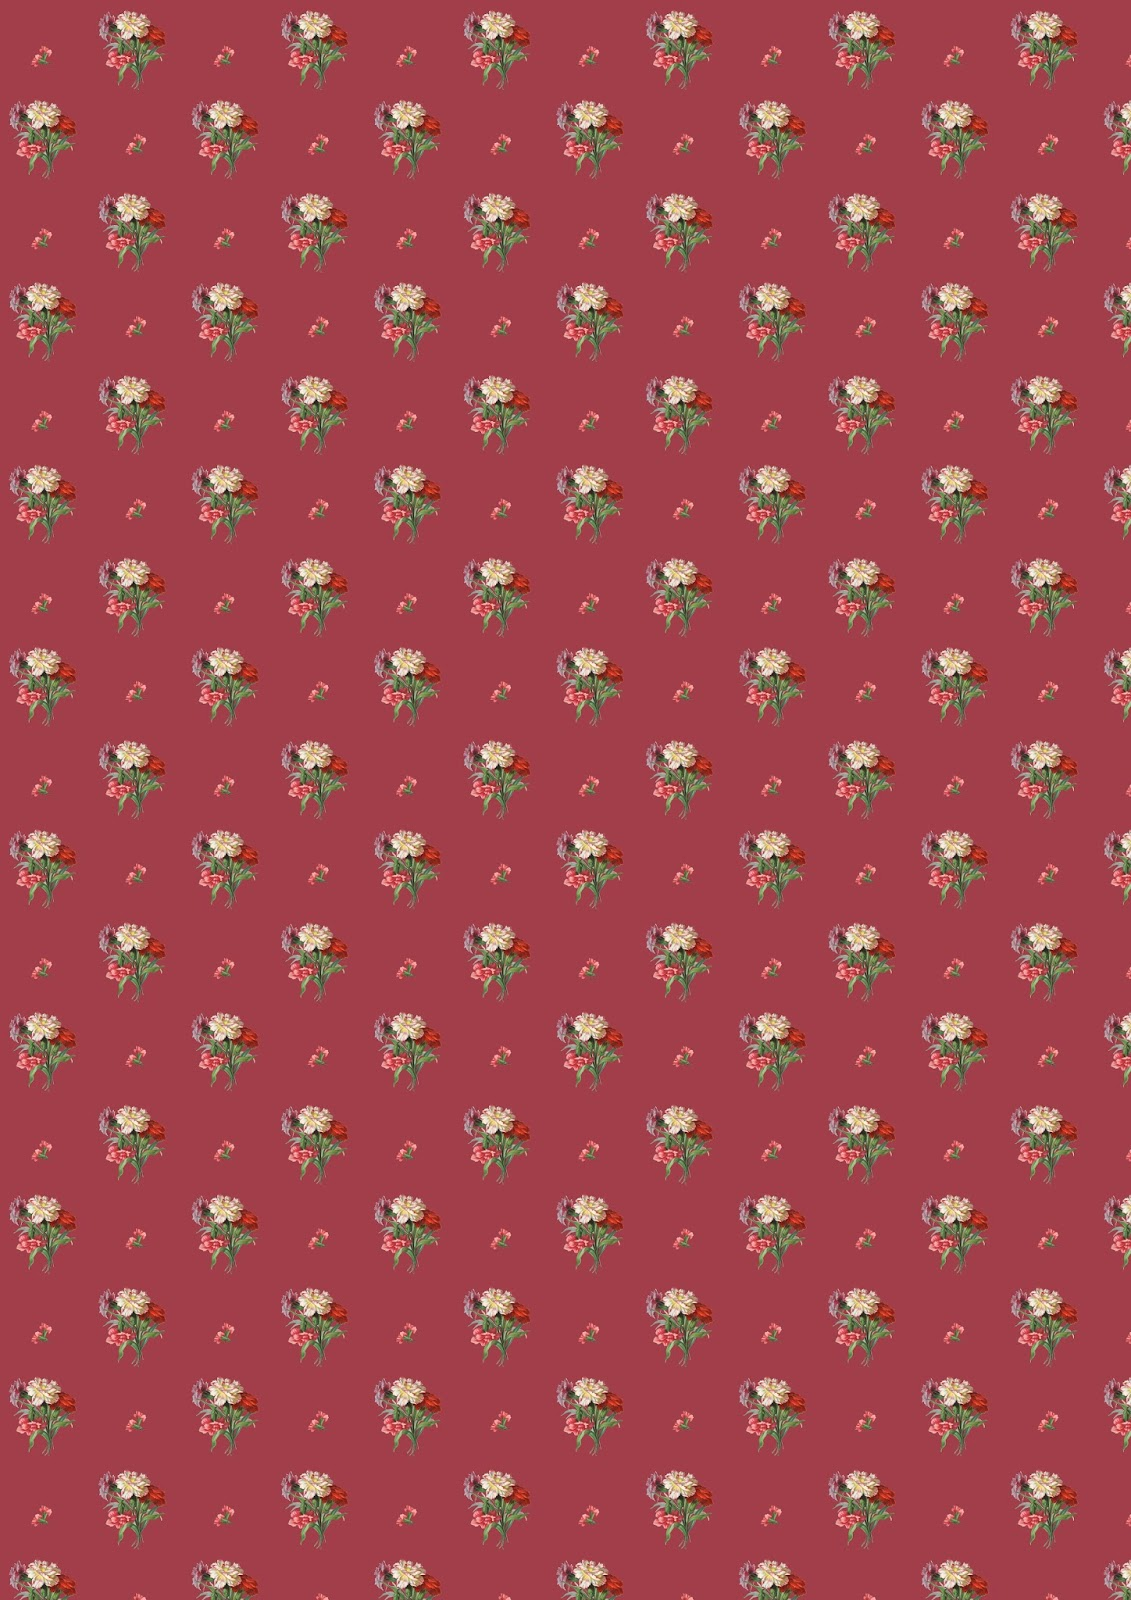 http://1.bp.blogspot.com/-E2U5XbfXWHs/U2uMkWUiffI/AAAAAAAAeS8/pS9HHDFika8/s1600/flower_paper_red_A4.jpg